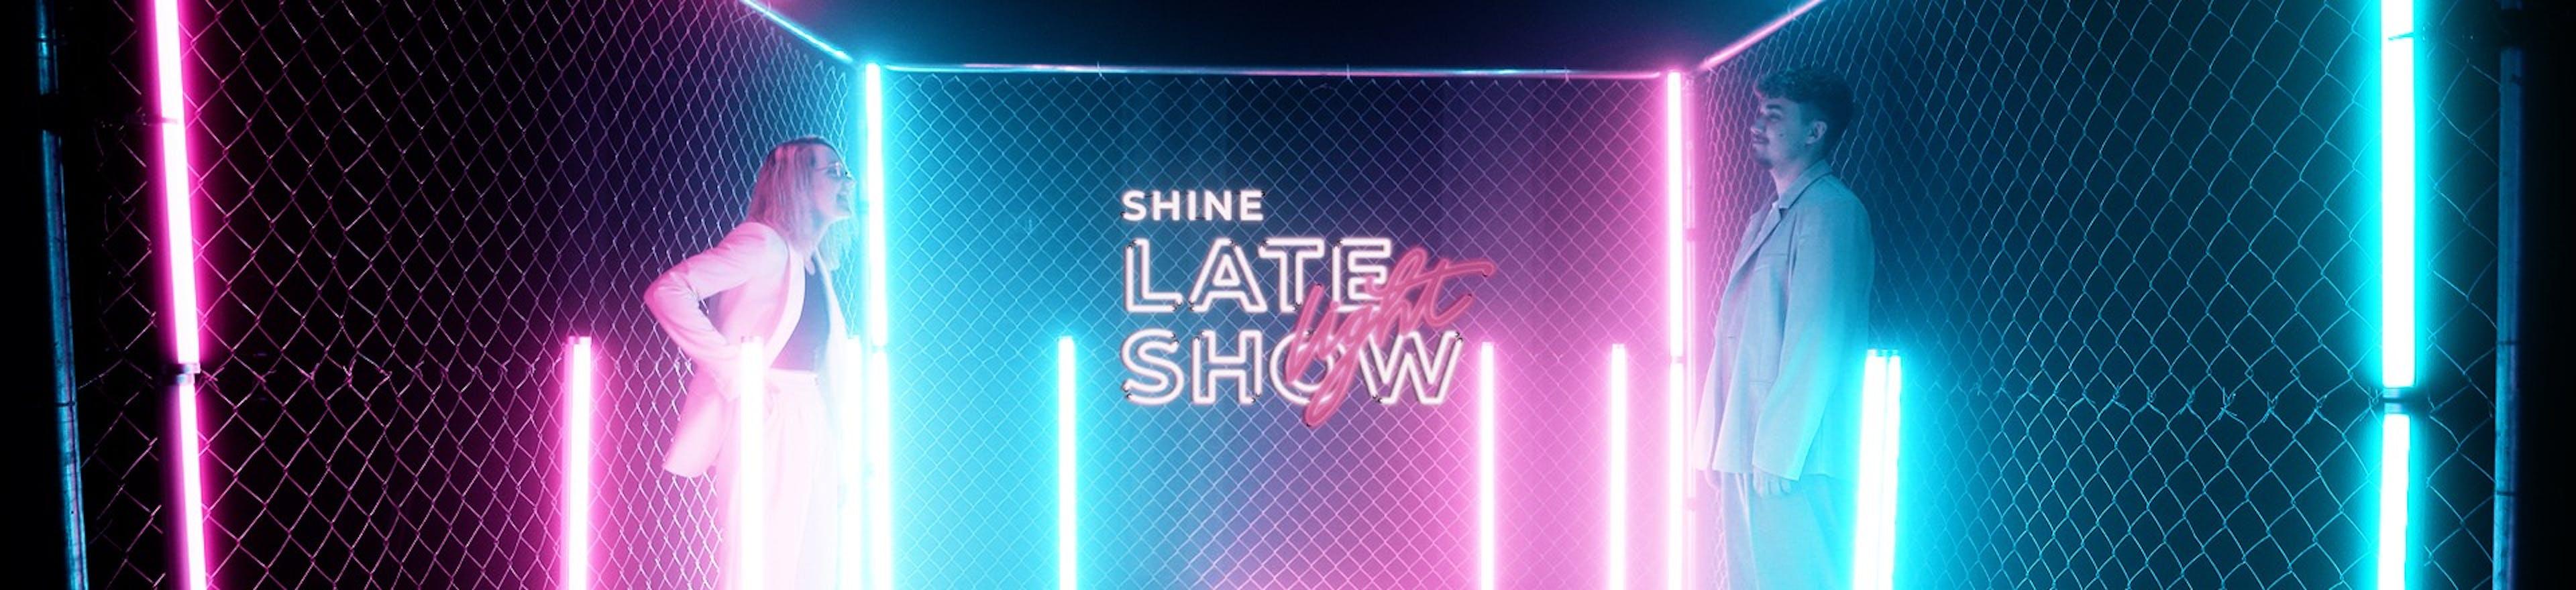 Late Light Show